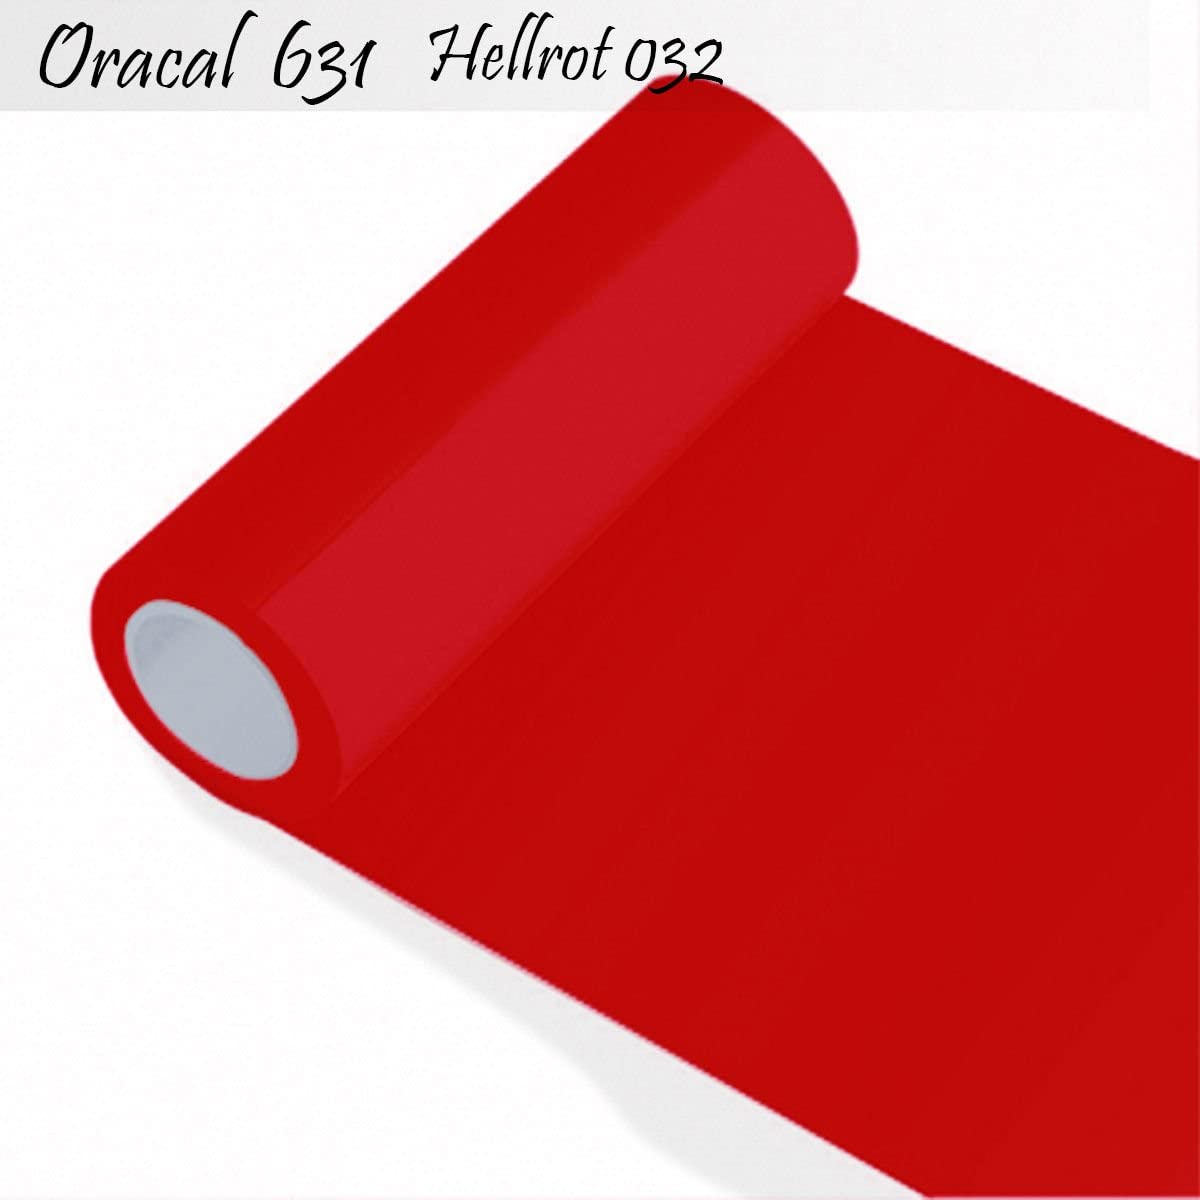 ORACAL 631 – Orafol Mate – Pantalla para plotter – para armarios de cocina y decoración de pantalla 5 m rollo rollo de lámina – 31,5 cm Altura – 32 de color